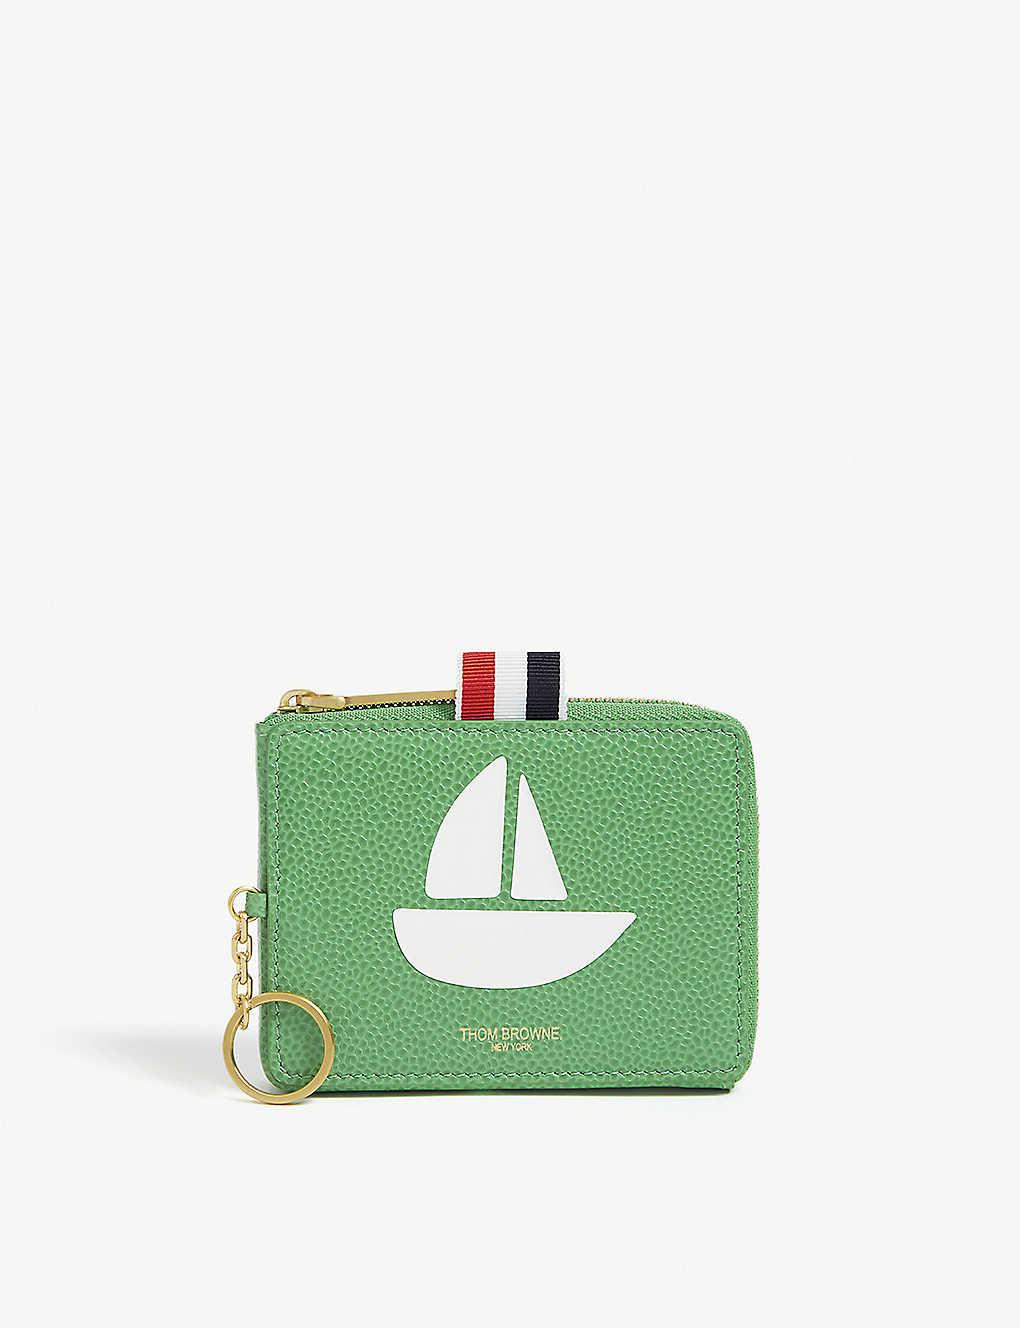 8cbb4b684aa THOM BROWNE - Sailboat print leather coin purse | Selfridges.com